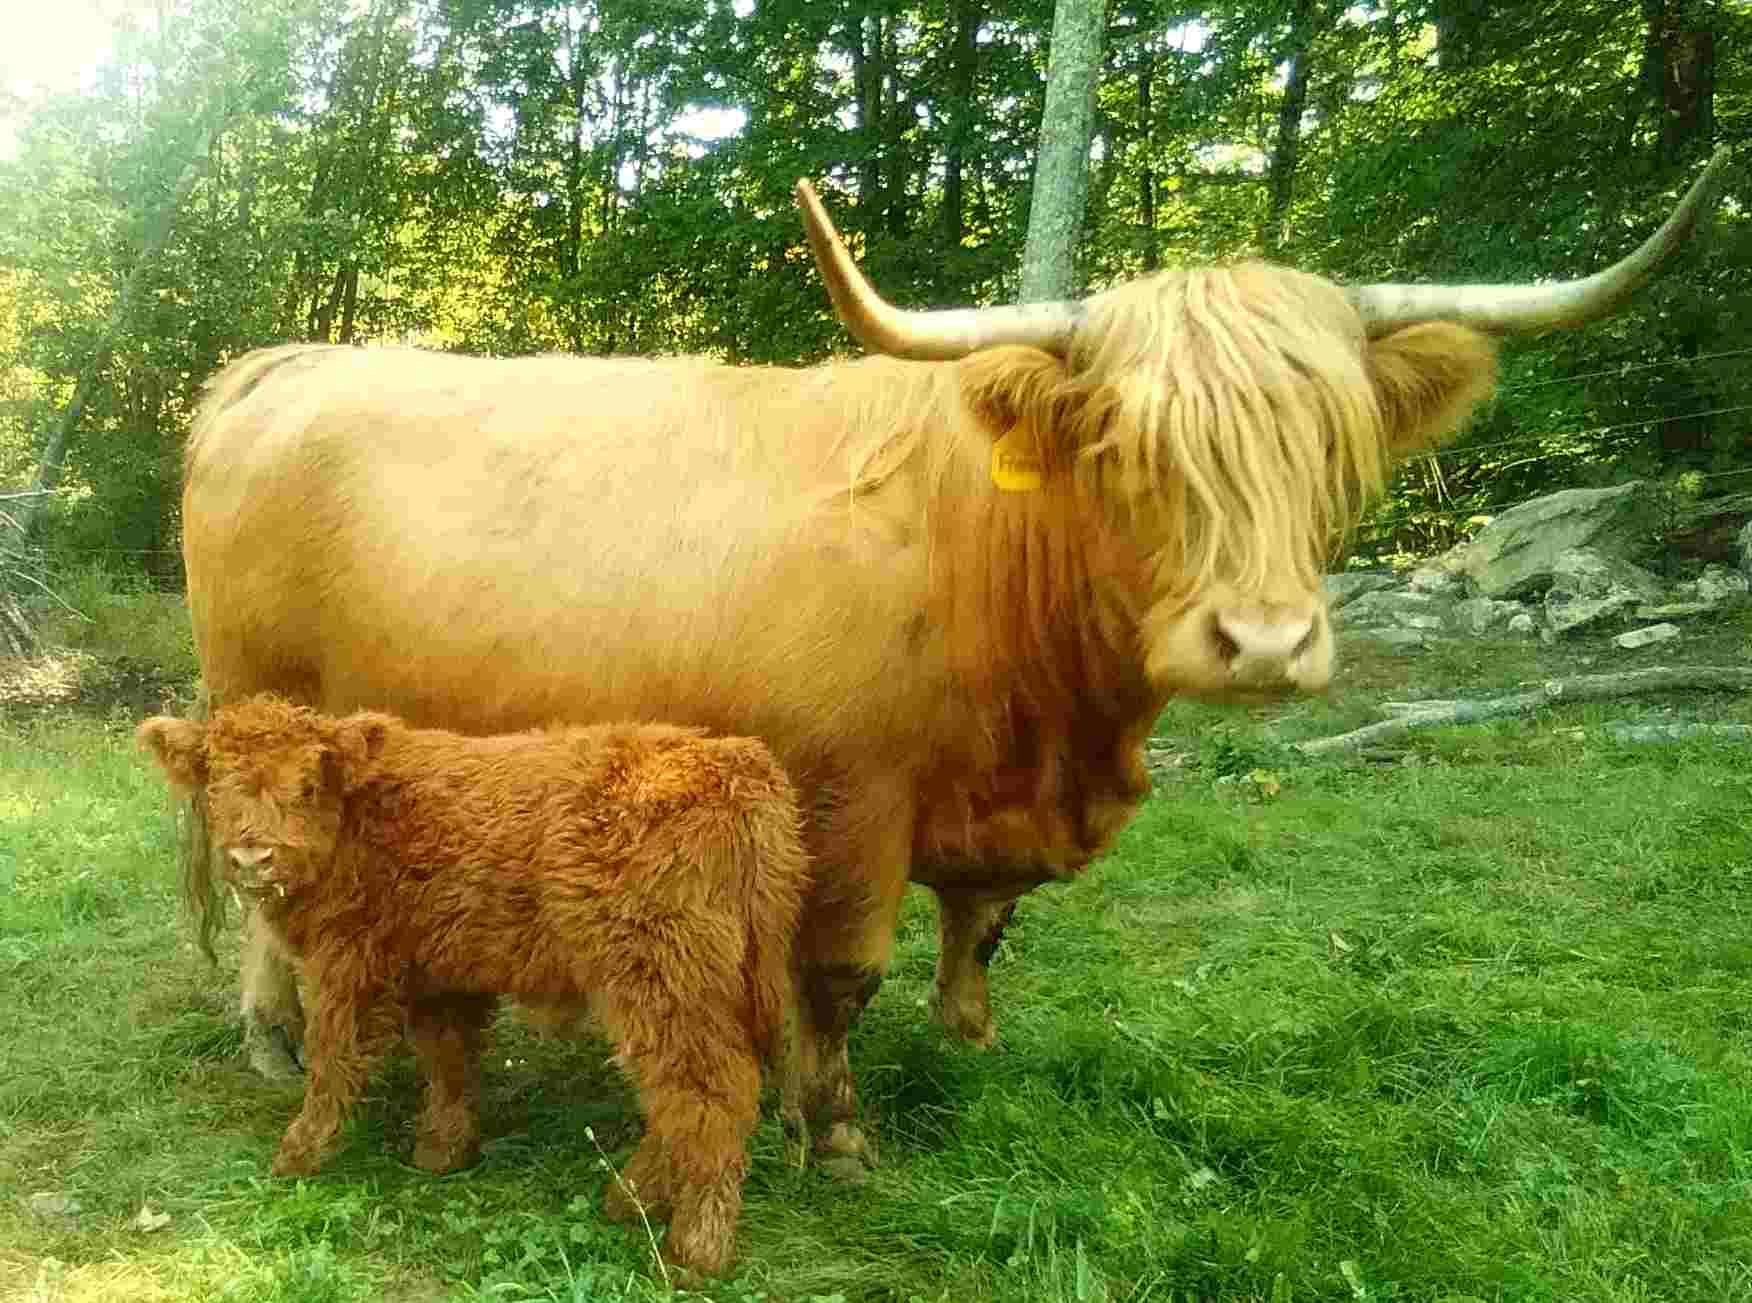 Mortimer, Scottish Highlander Bull Calf born 7/30/2021, pictured with his mother, Francine, $1900